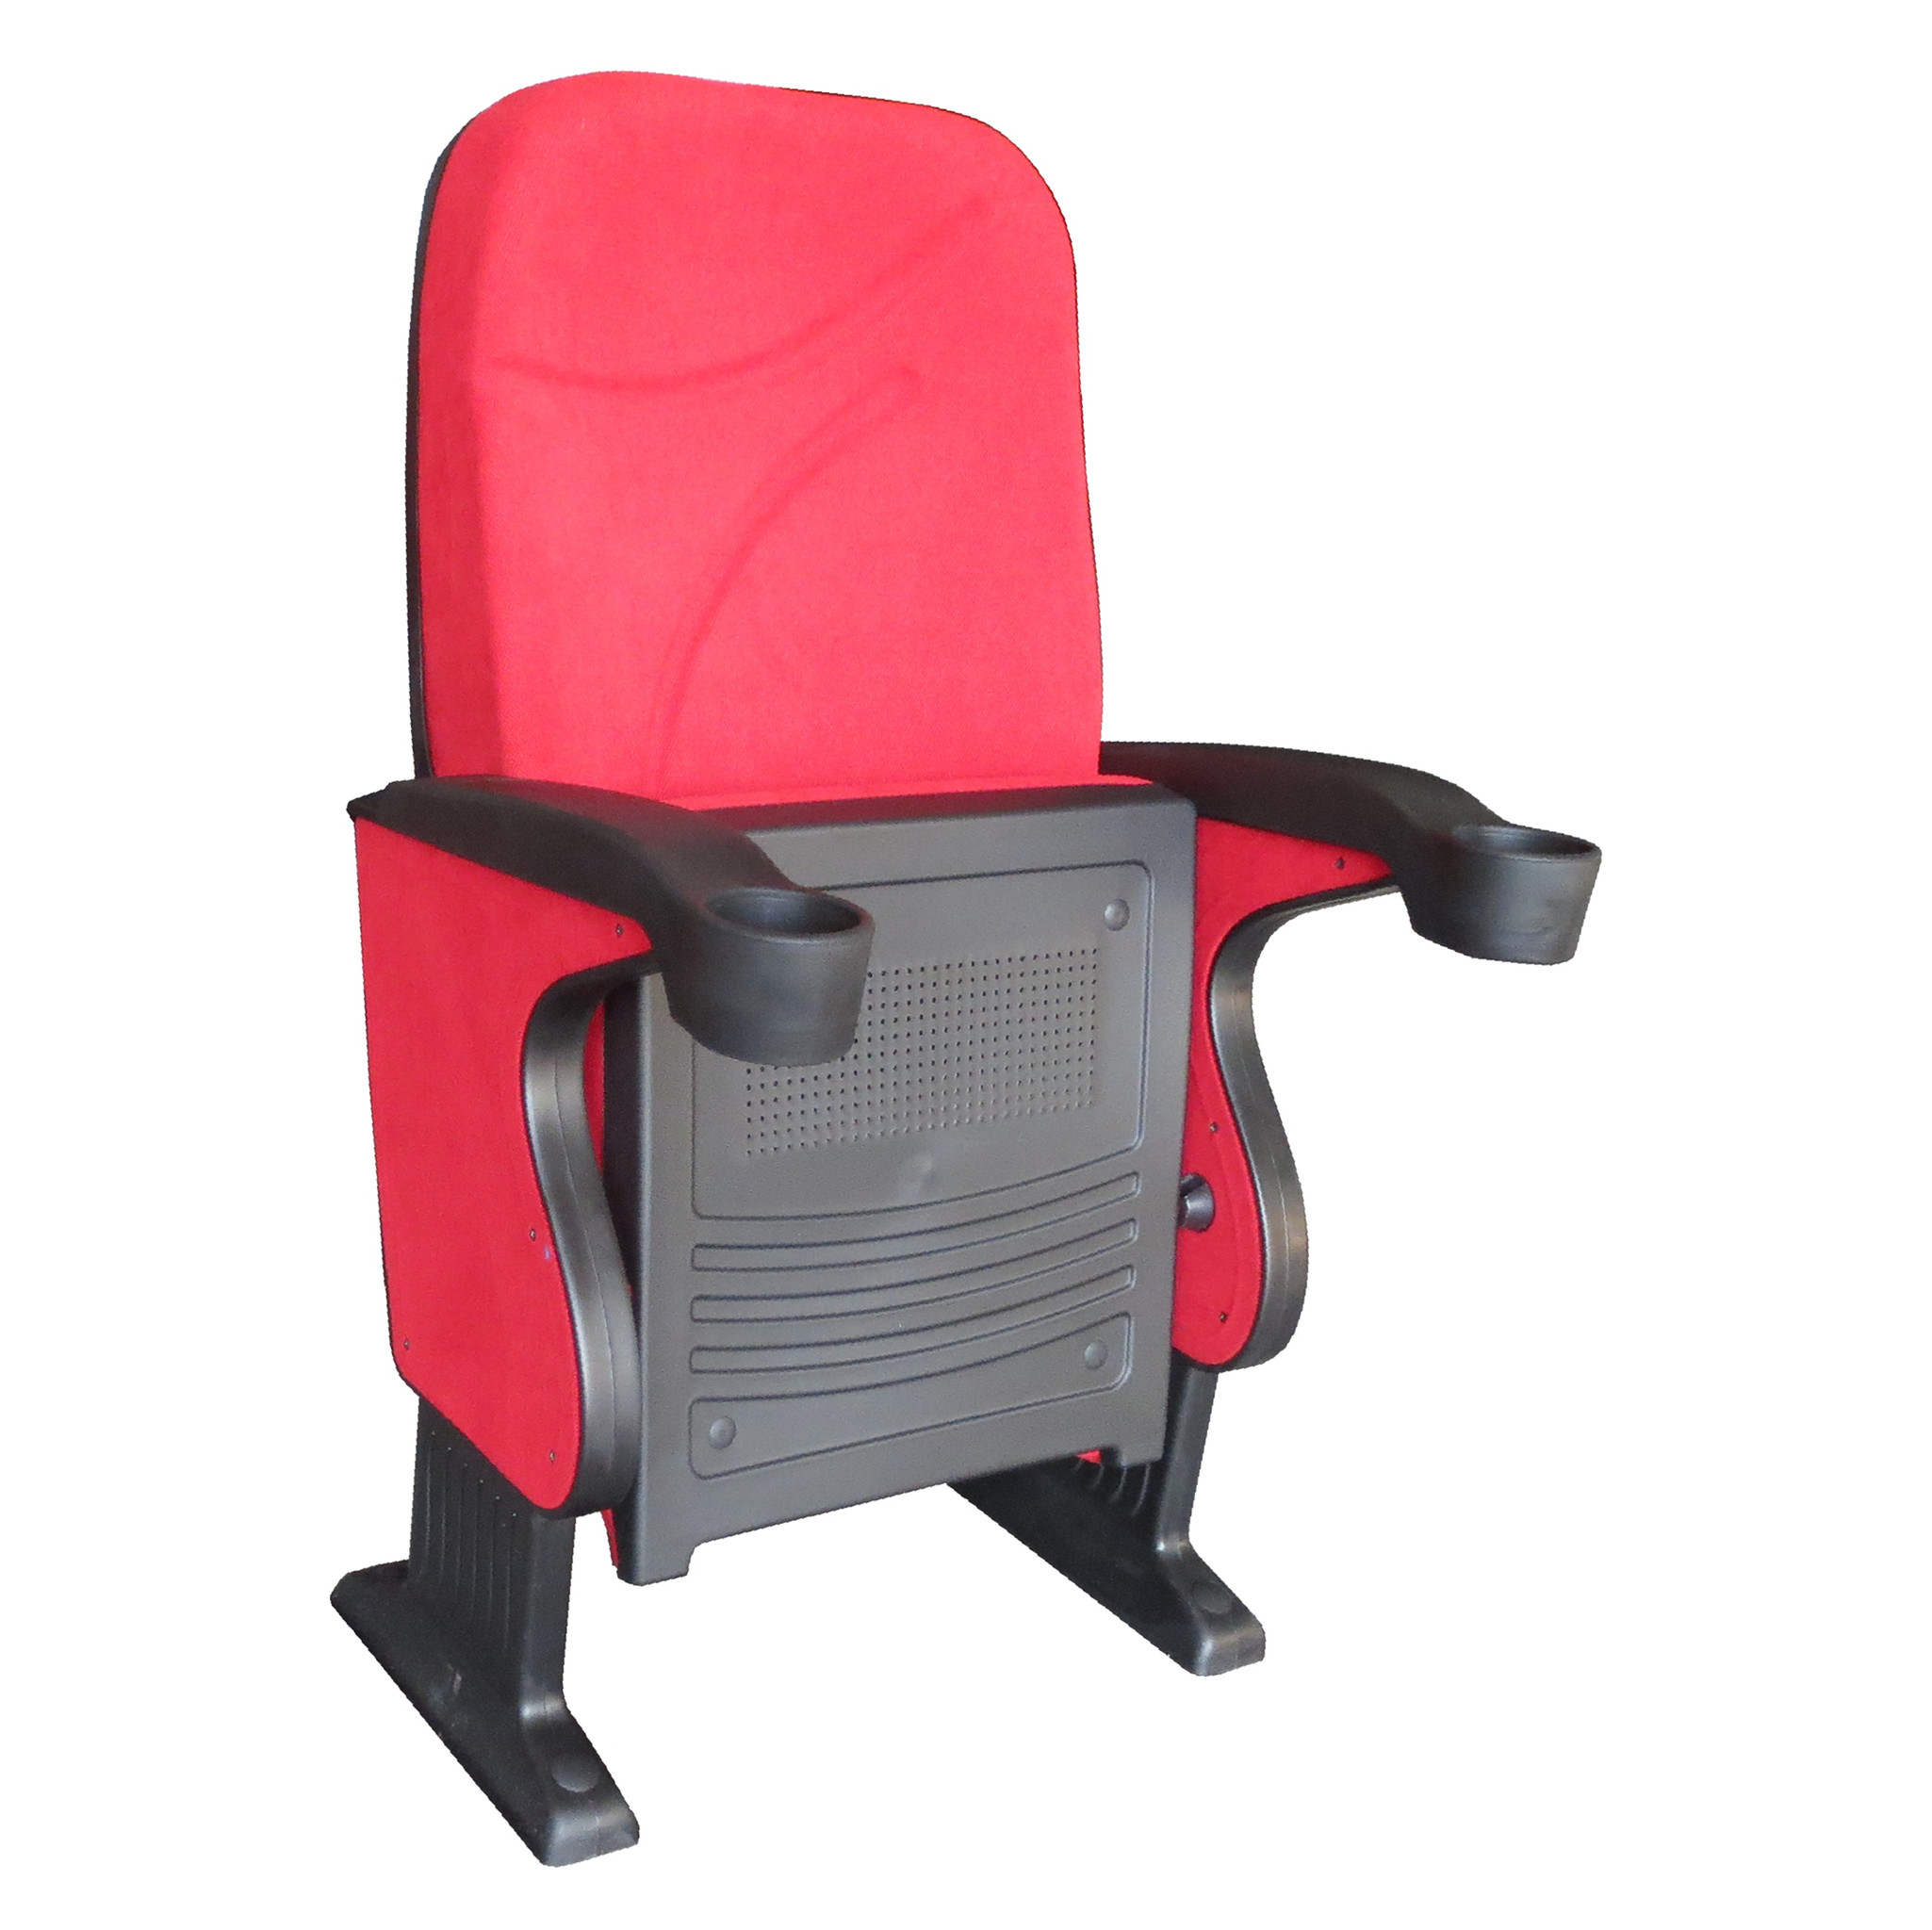 BOLTON S60 – Auditorium, Cinema, Movie Theatre Chair with Integrated Polyurethane Cup Holder- Turkey – Seatorium – Public Seating Manufacturer